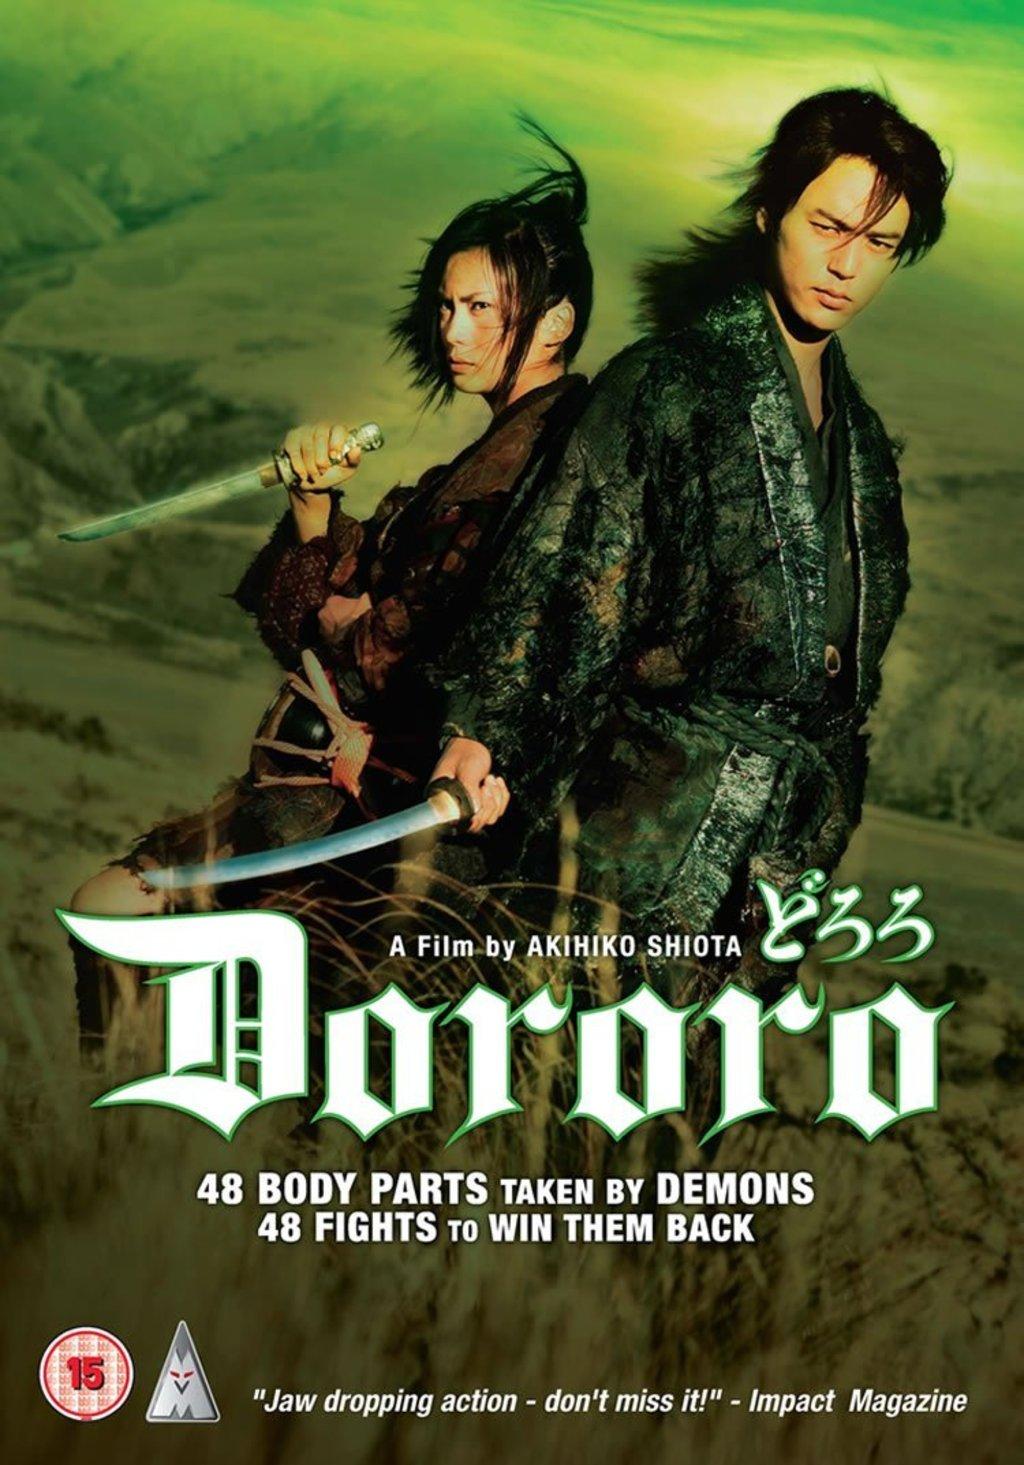 Netflix Quotes Wallpaper Watch Dororo On Netflix Today Netflixmovies Com